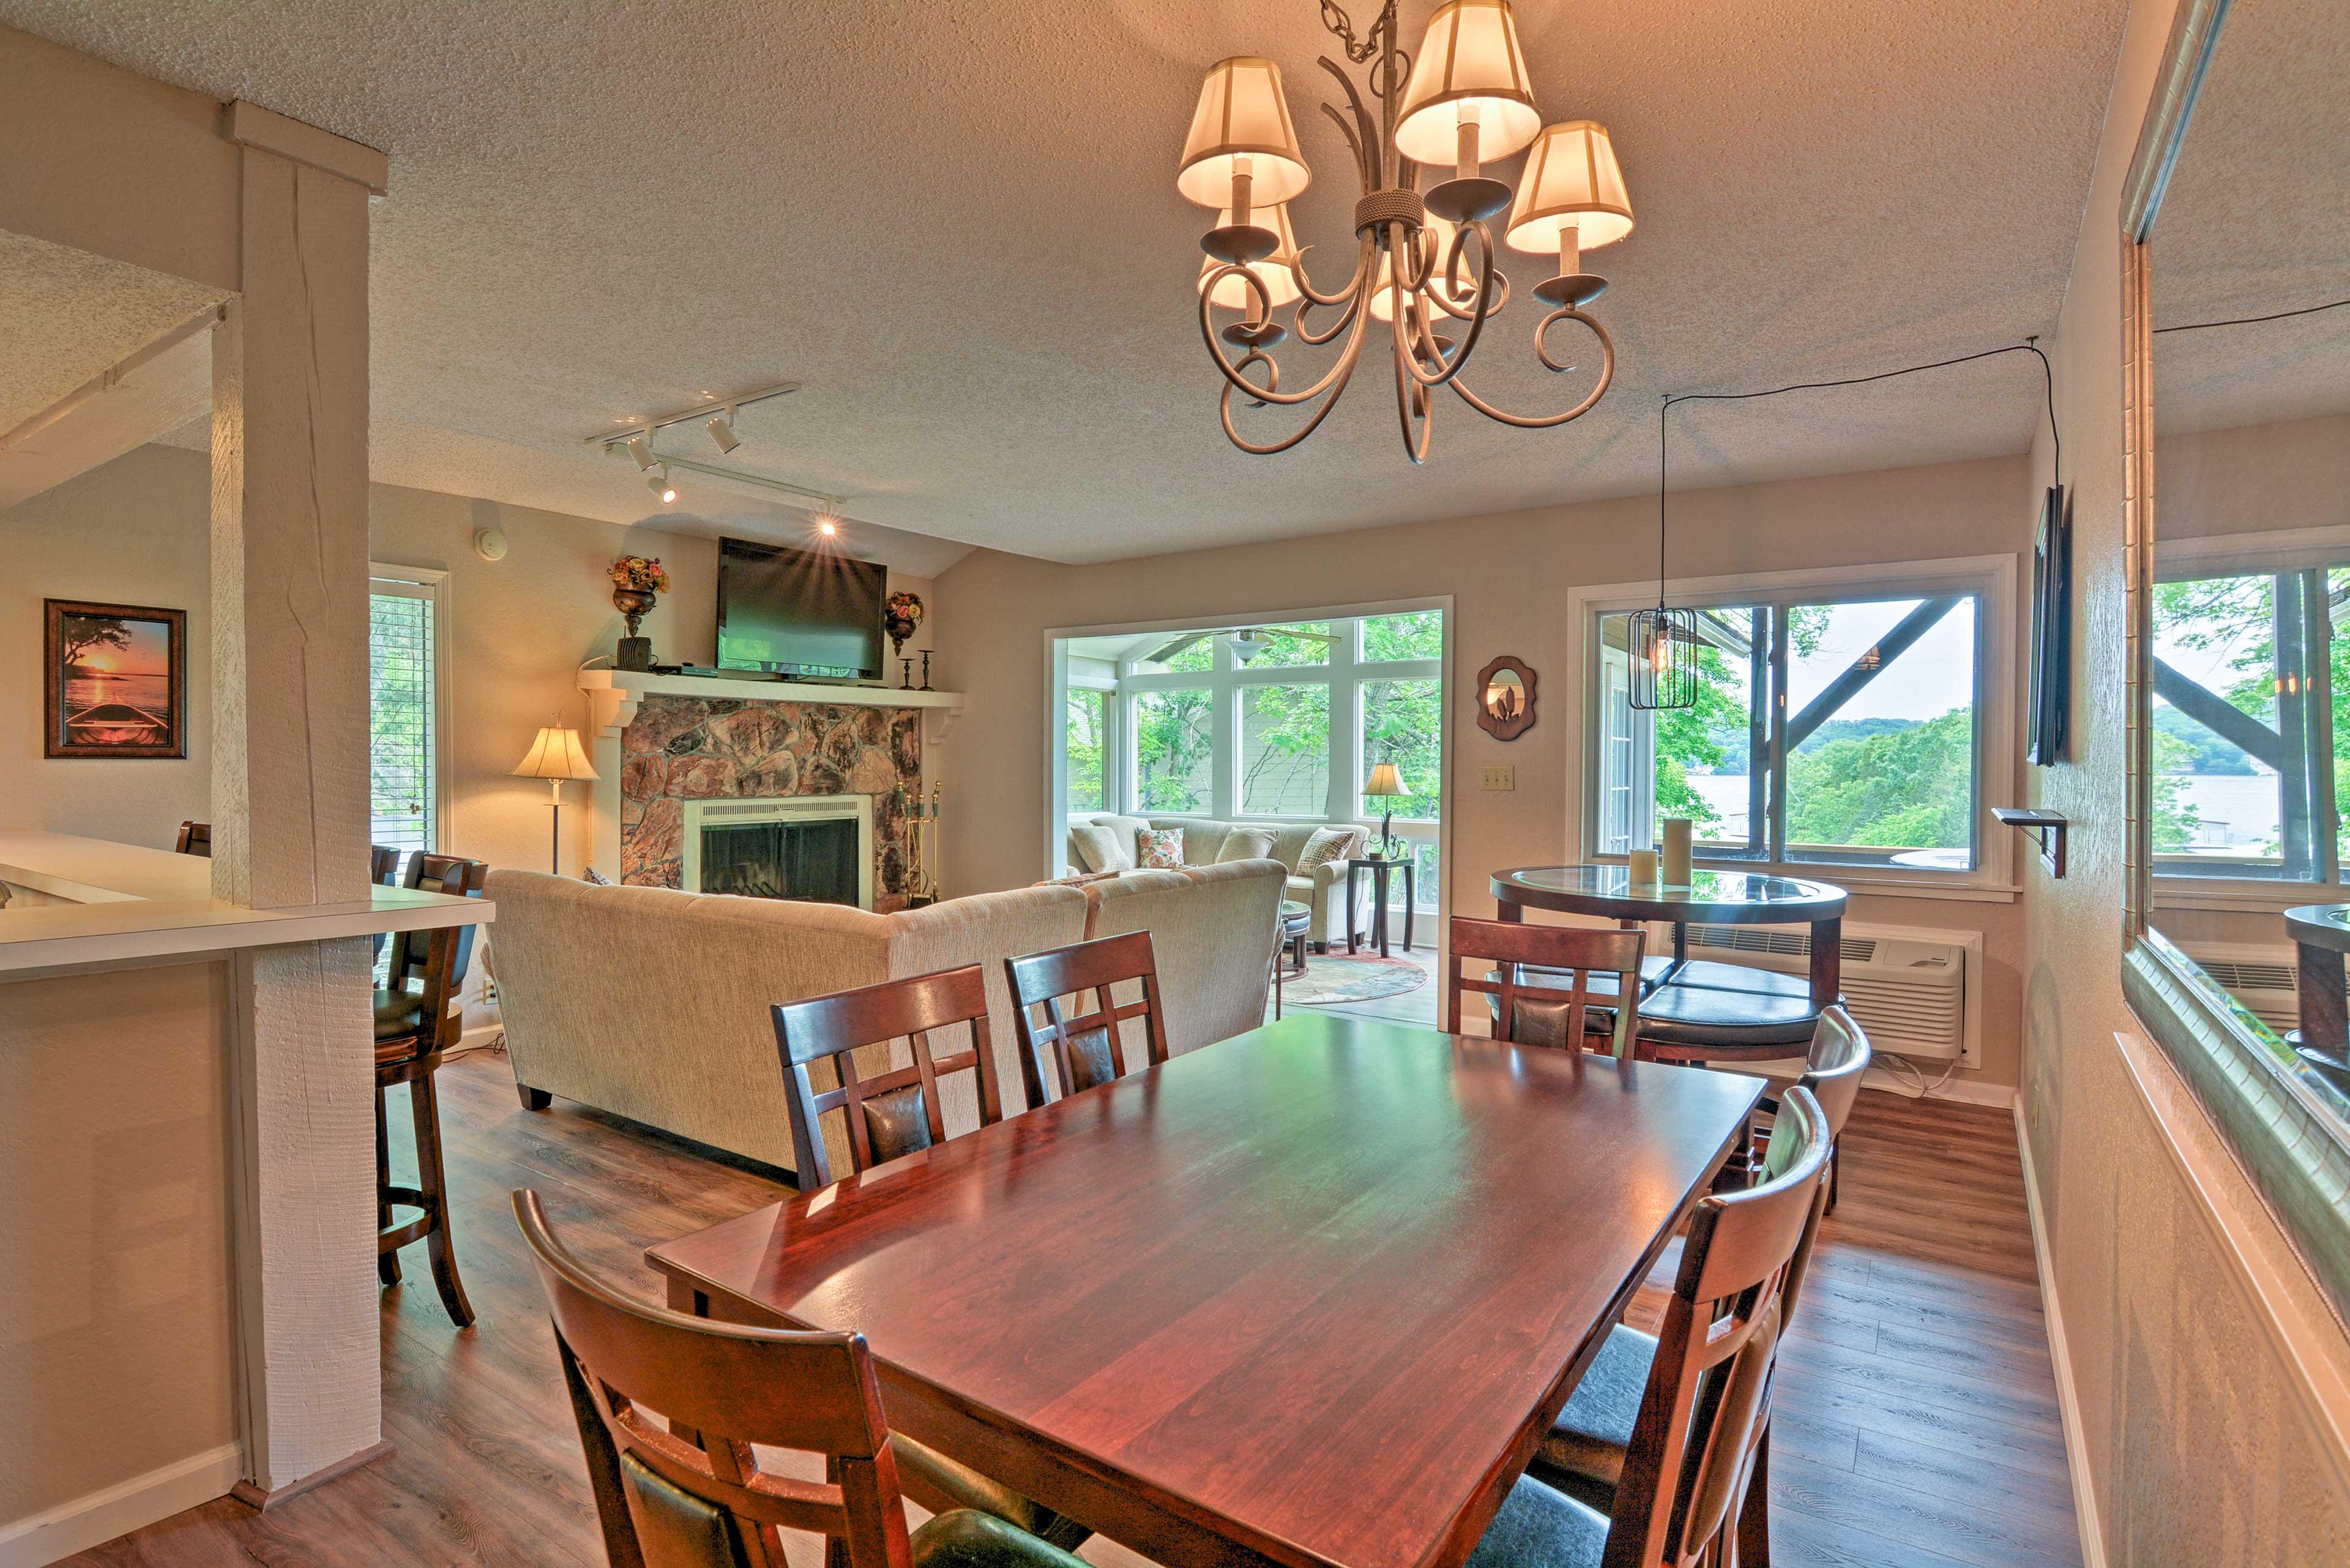 Dining Room | Dishware & Flatware